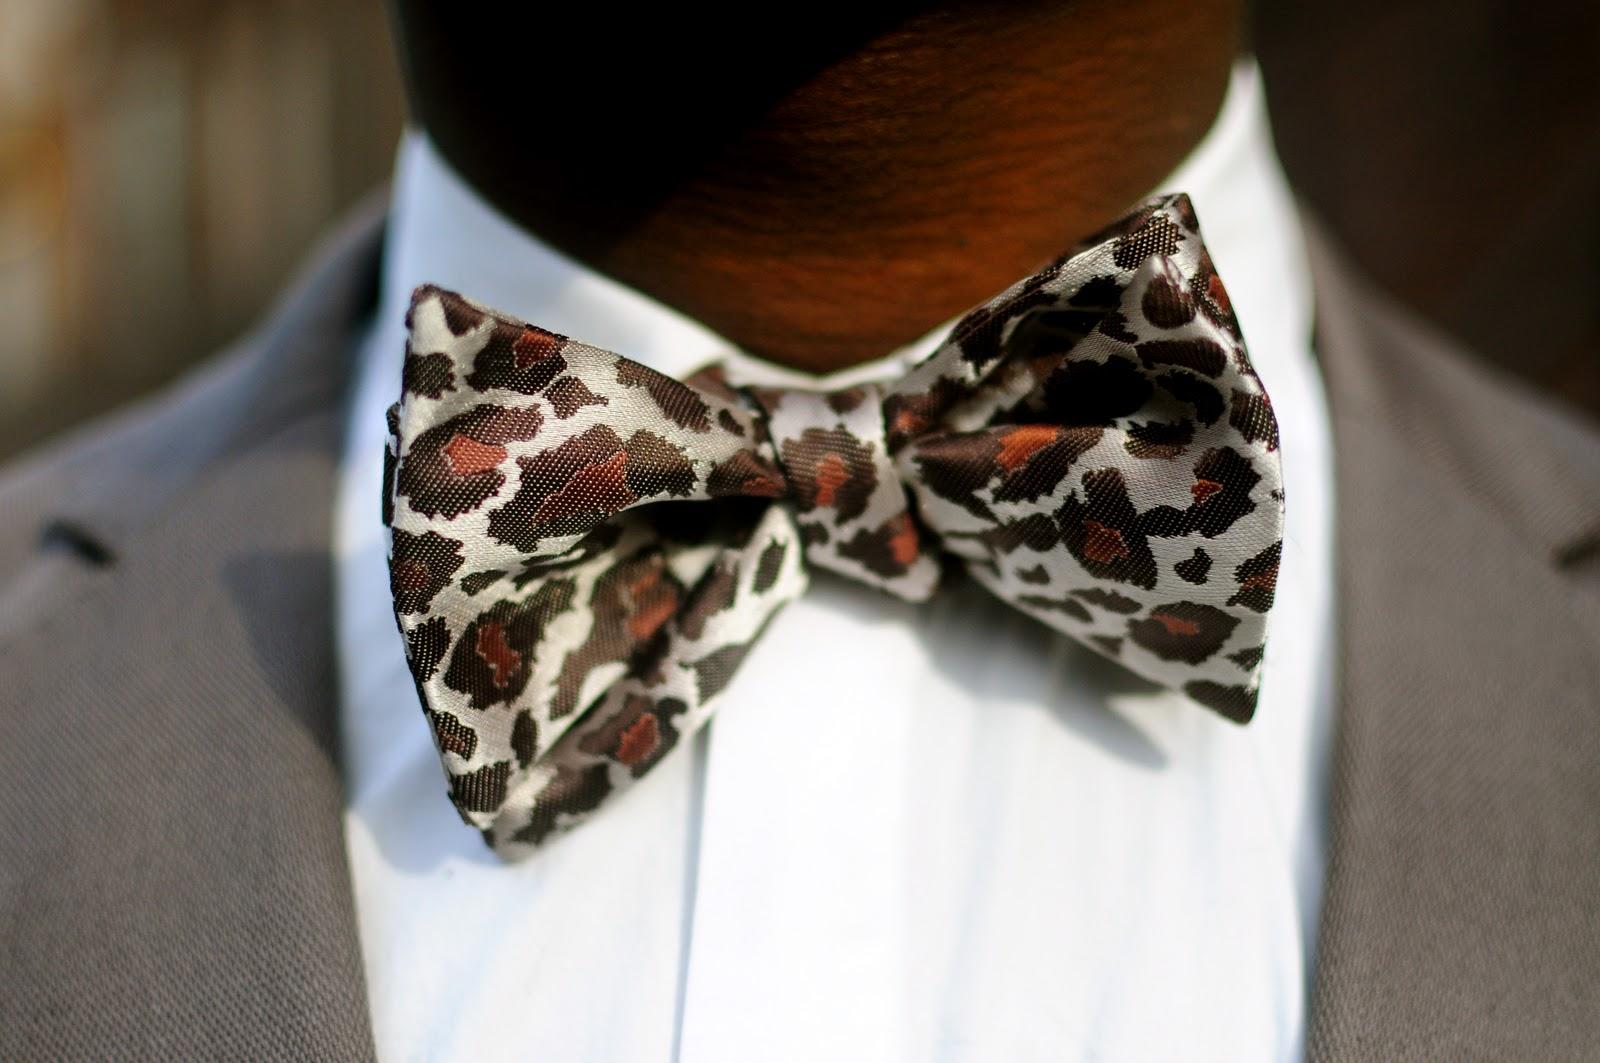 Man Wearing Bow Tie - Hot Girls Wallpaper